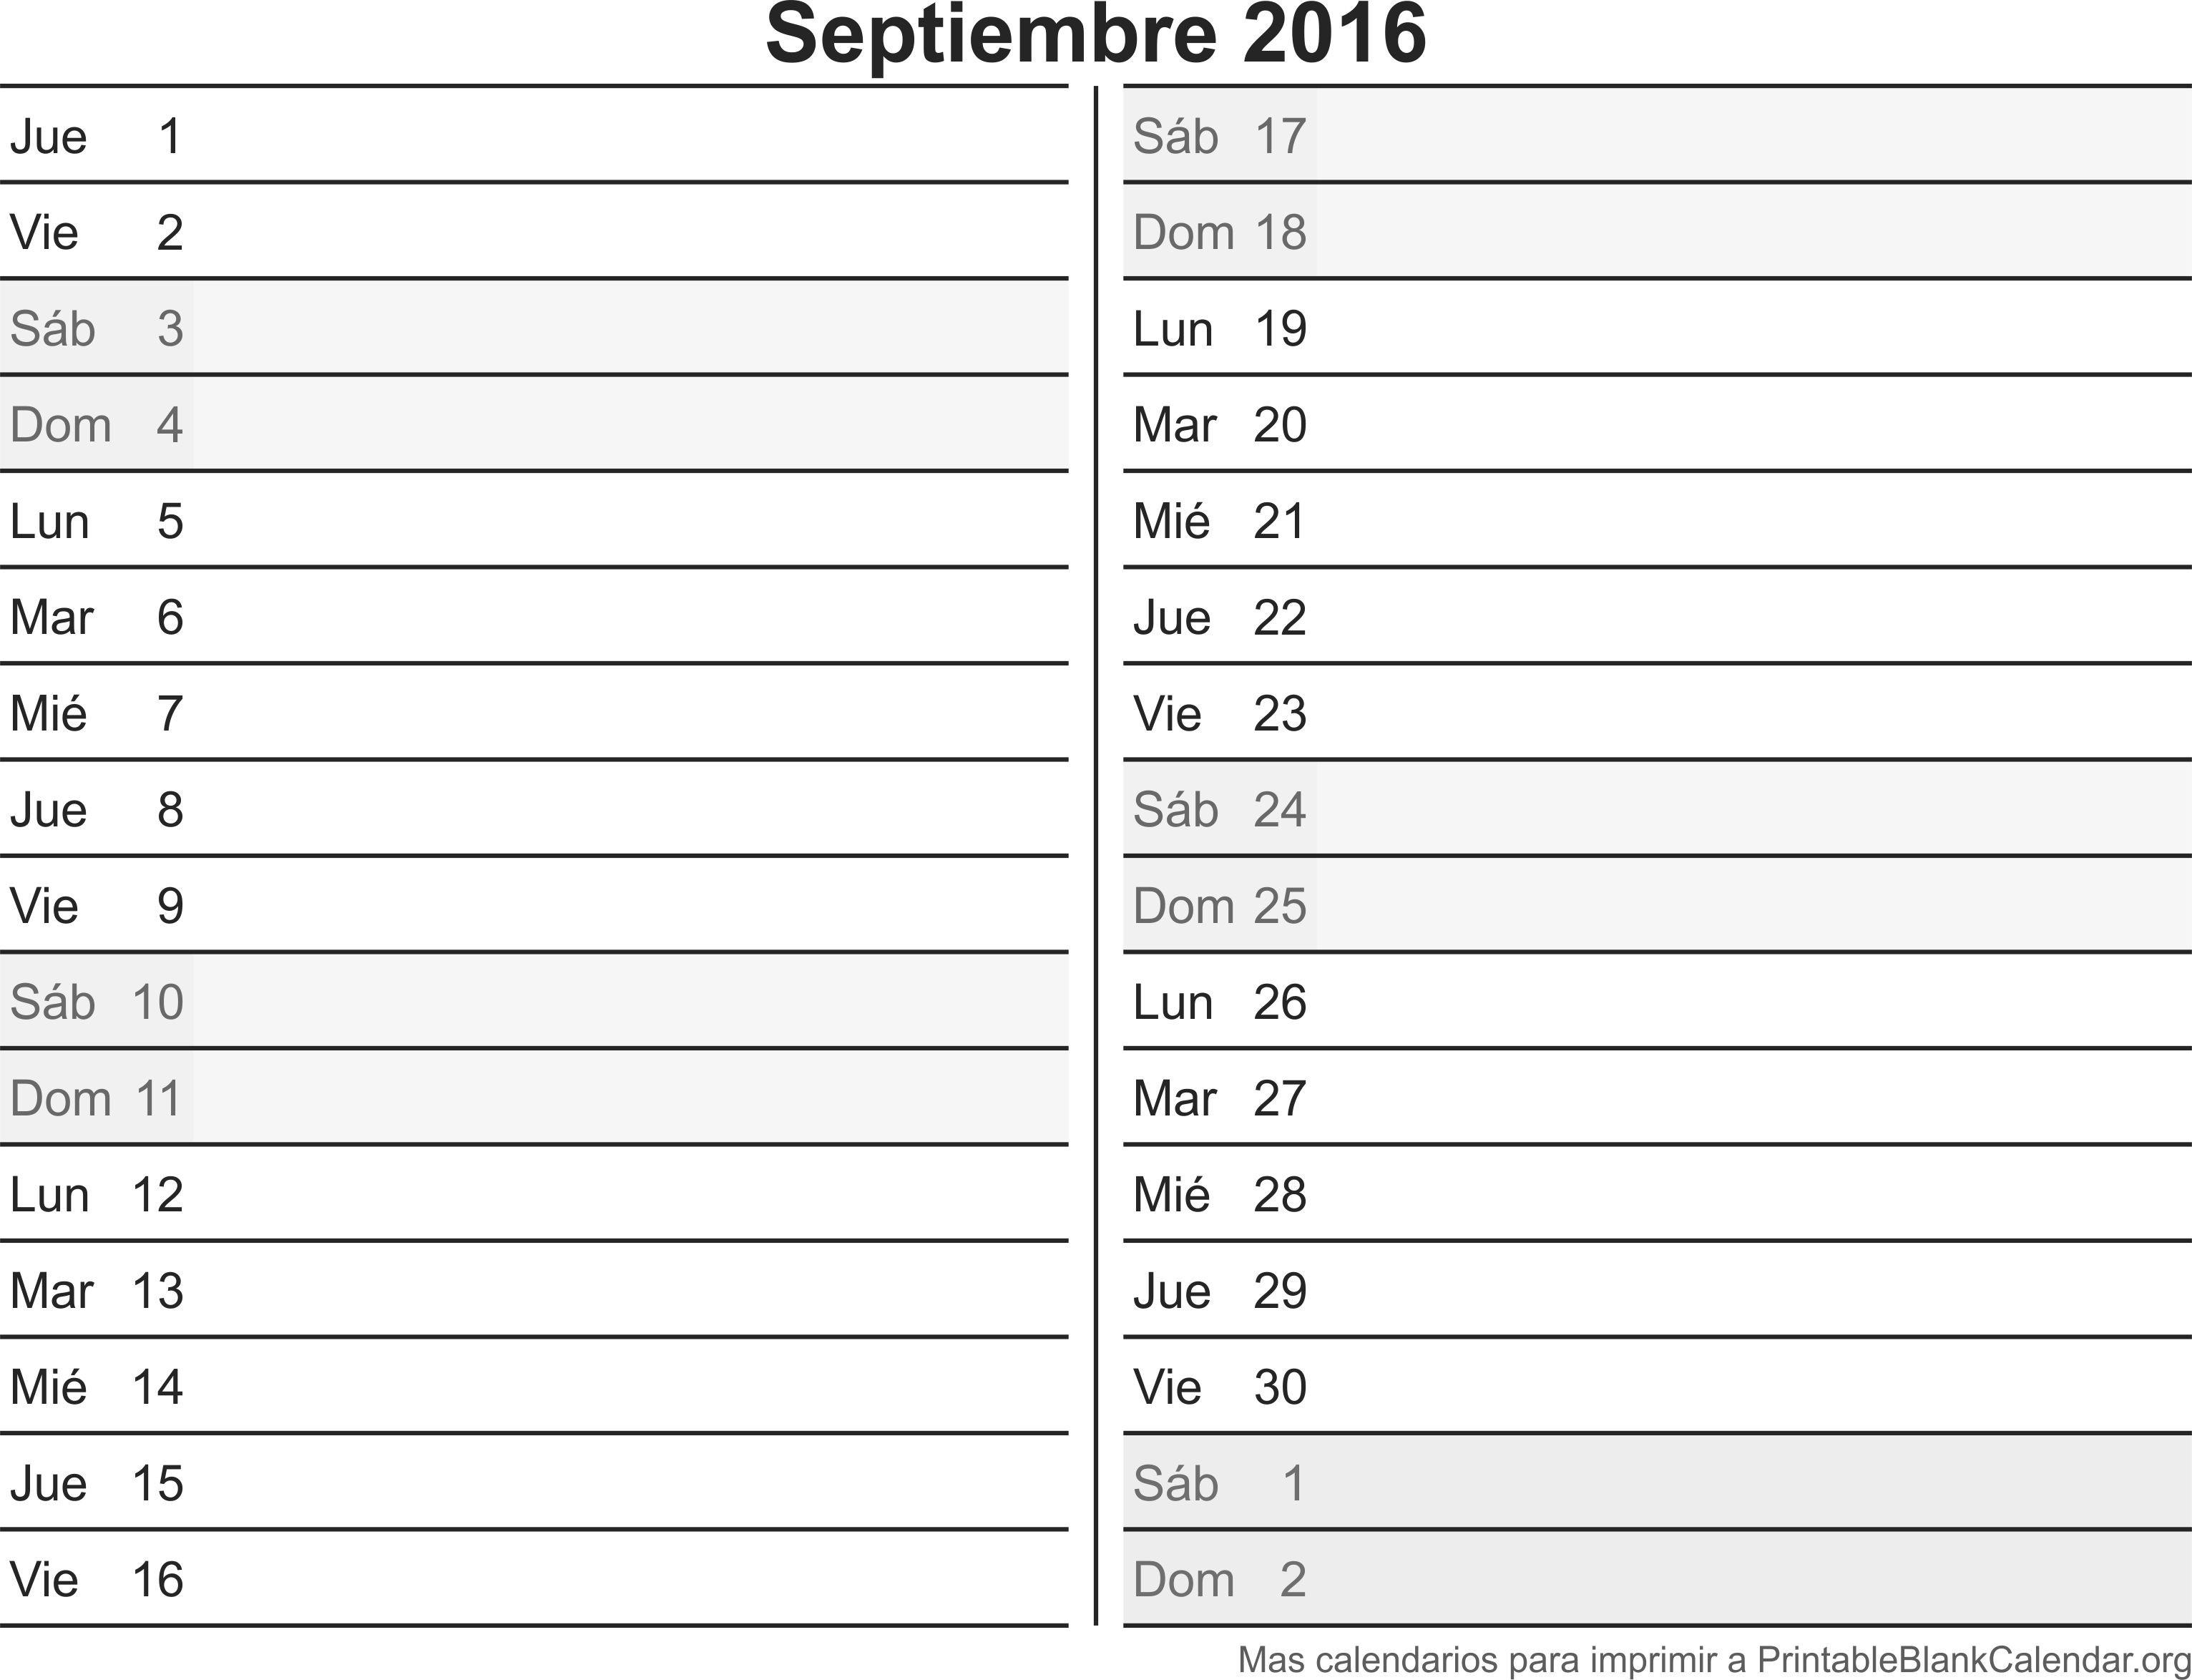 Calendario Para Imprimir Colombia 2017 Más Recientes List Of Synonyms and Antonyms Of the Word Imprimir Septiembre 2016 Of Calendario Para Imprimir Colombia 2017 Más Reciente Calendario Guatemala A±o 2016